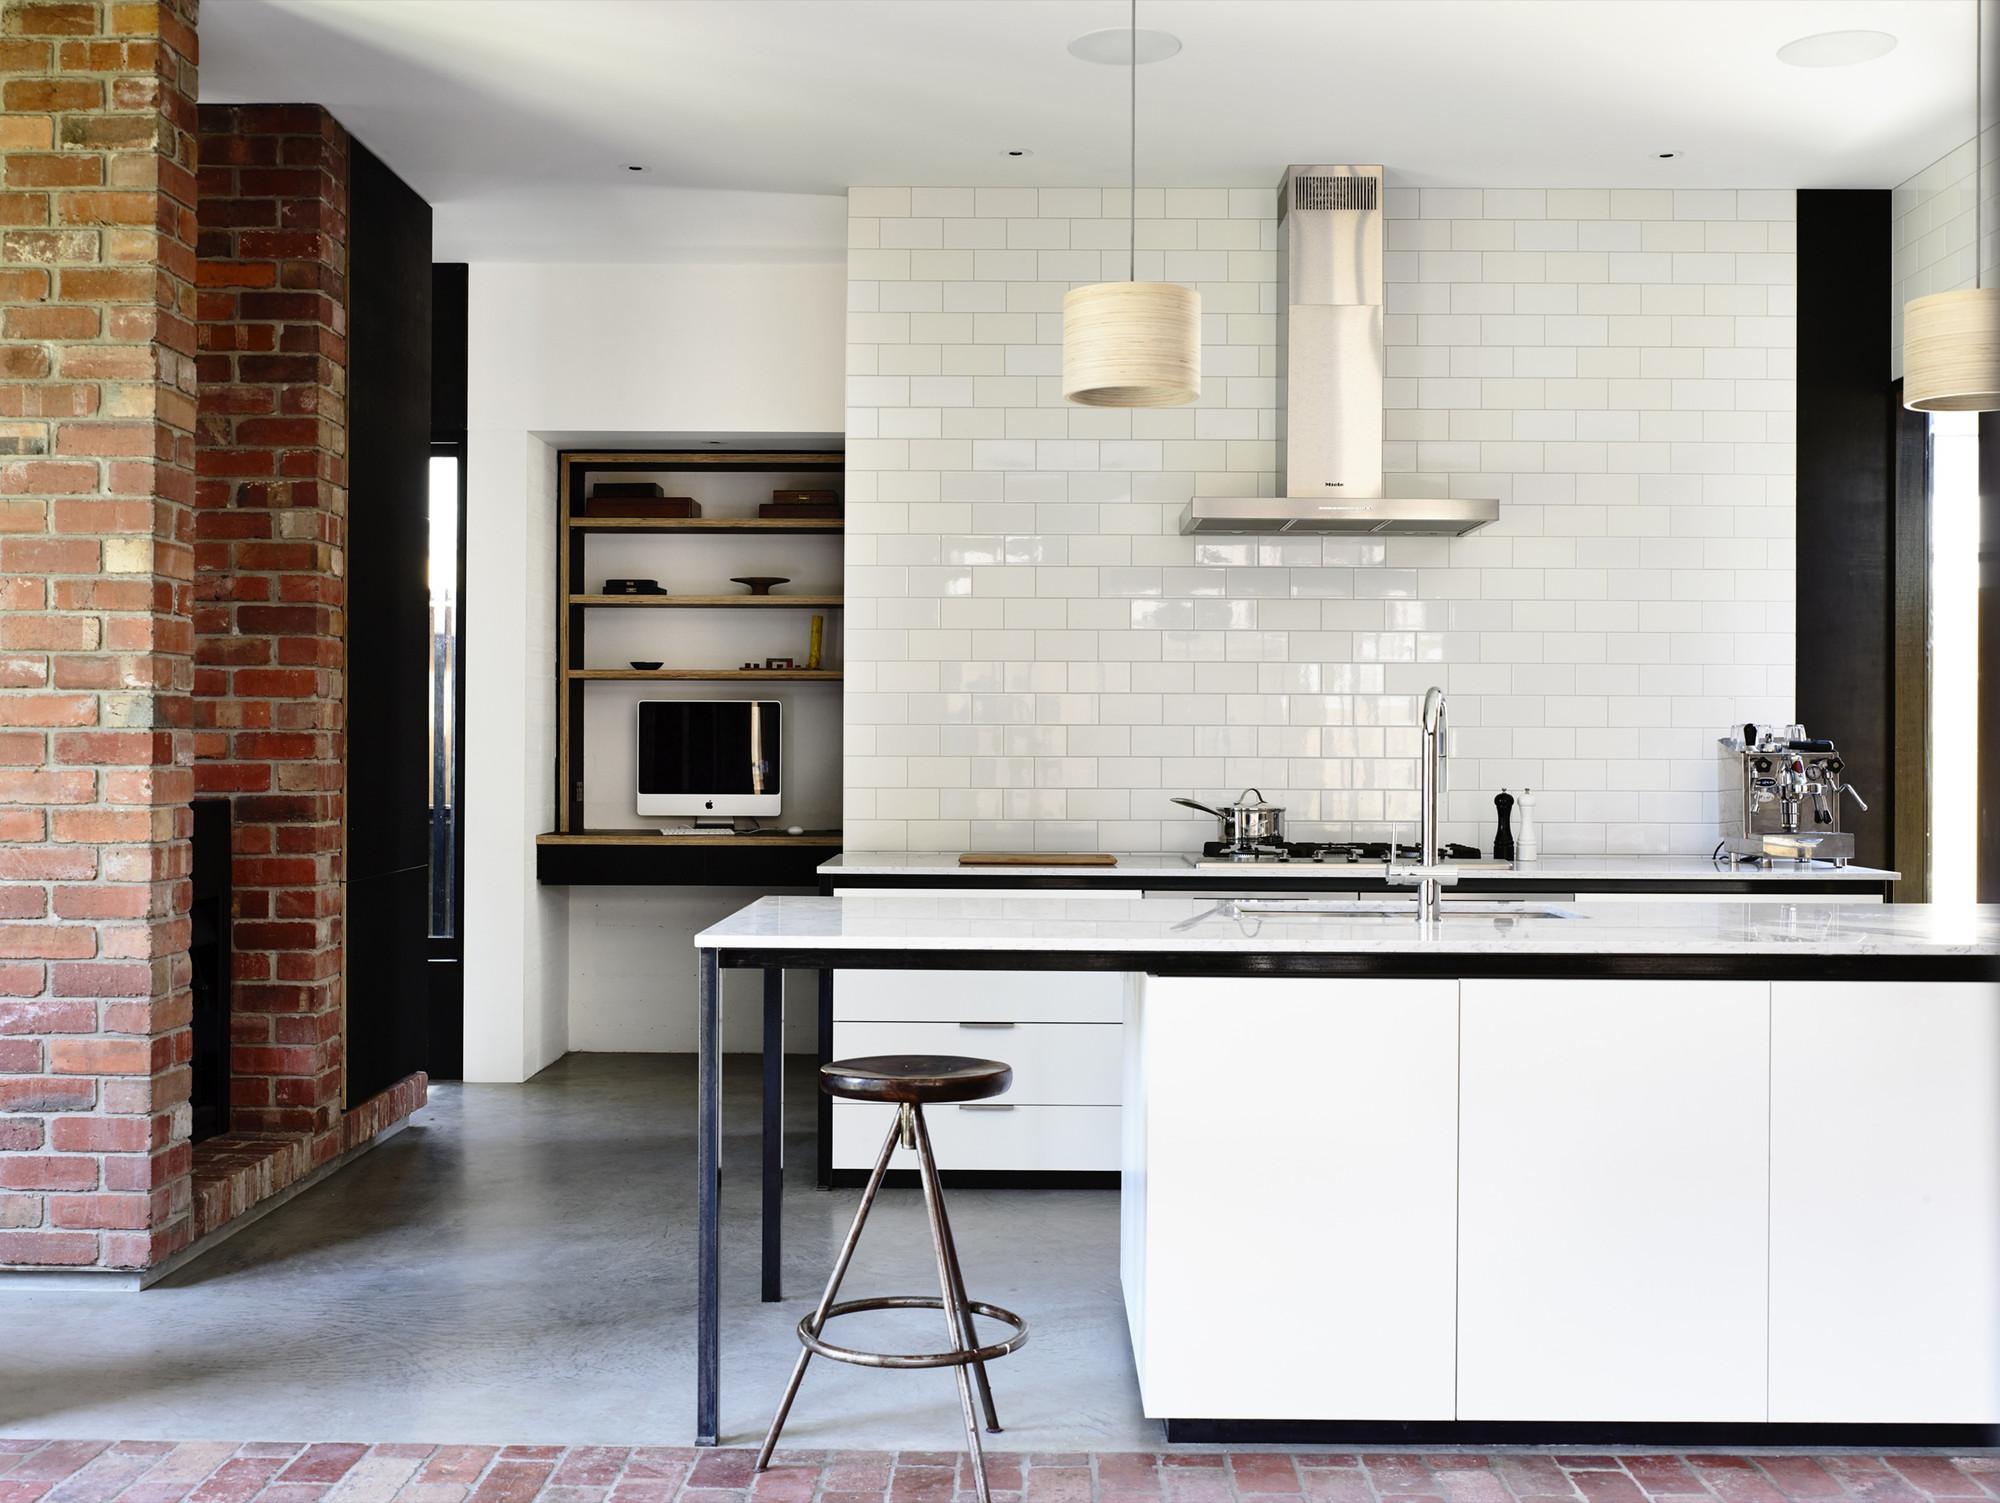 Northcote Residence / Wolveridge Architects, © Derek Swalwell